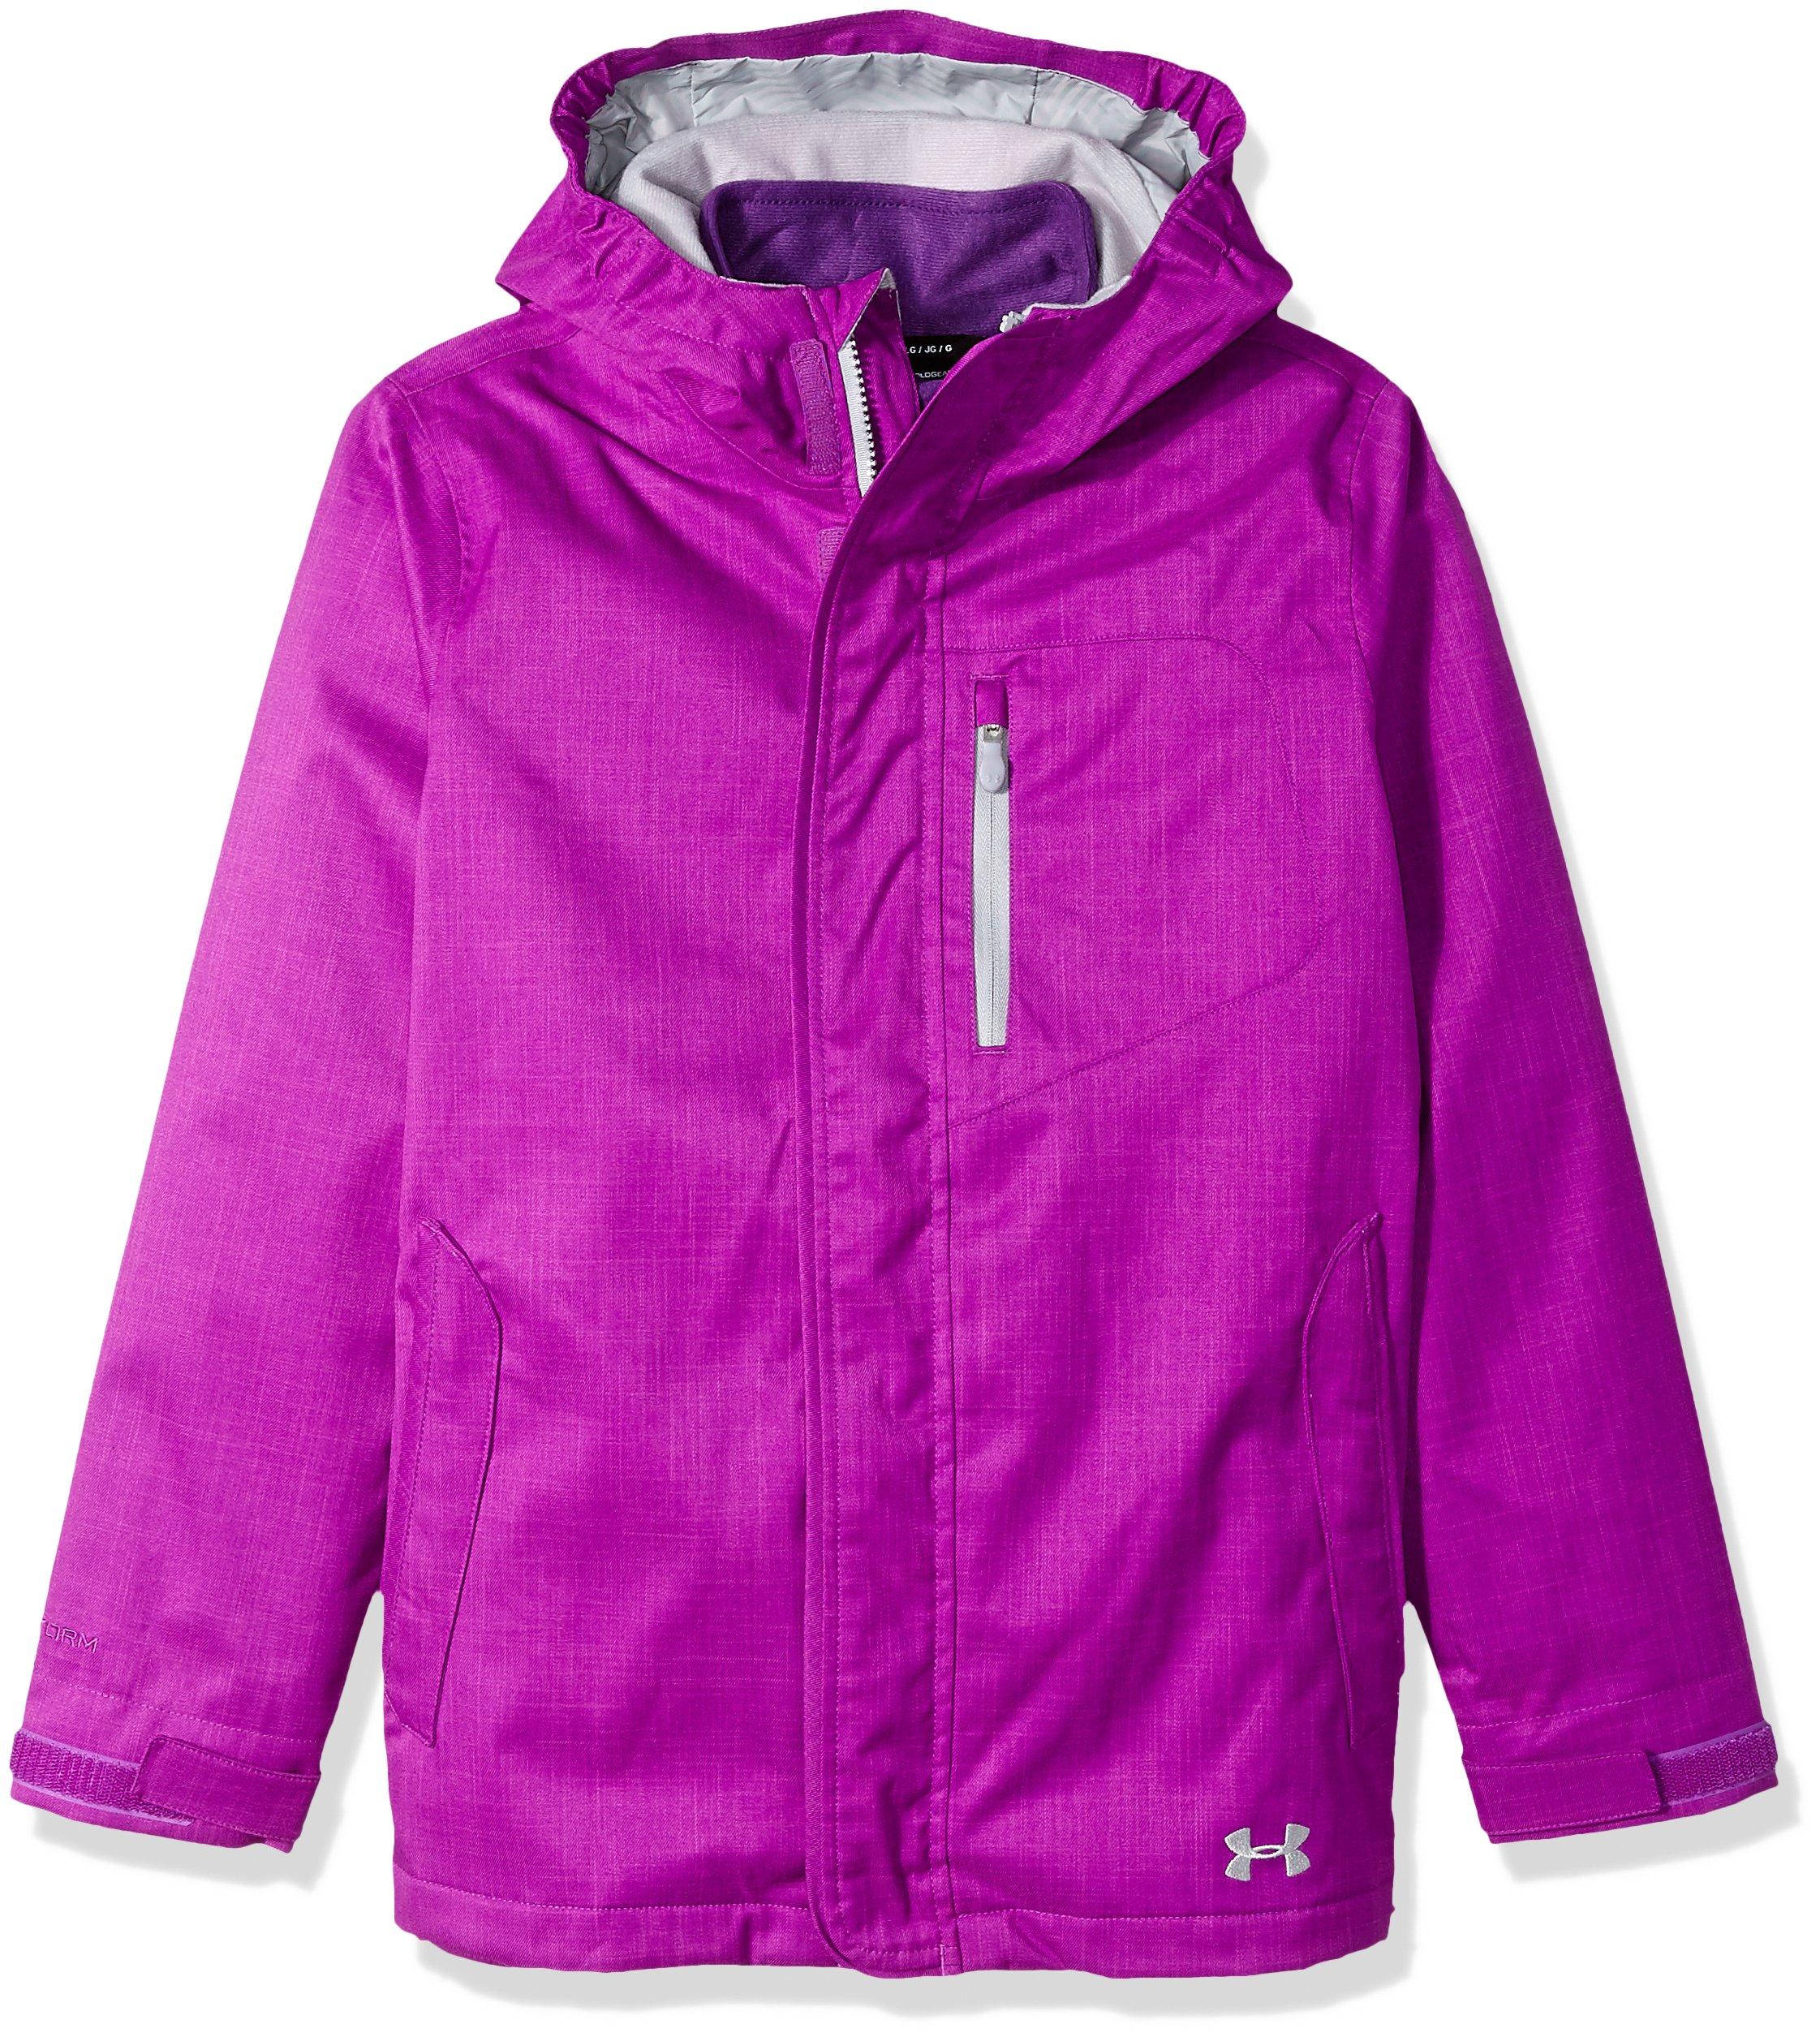 Under Armour Girls' ColdGear Infrared Gemma 3-in-1 Jacket, Purple Rave/Overcast Gray, Youth Medium